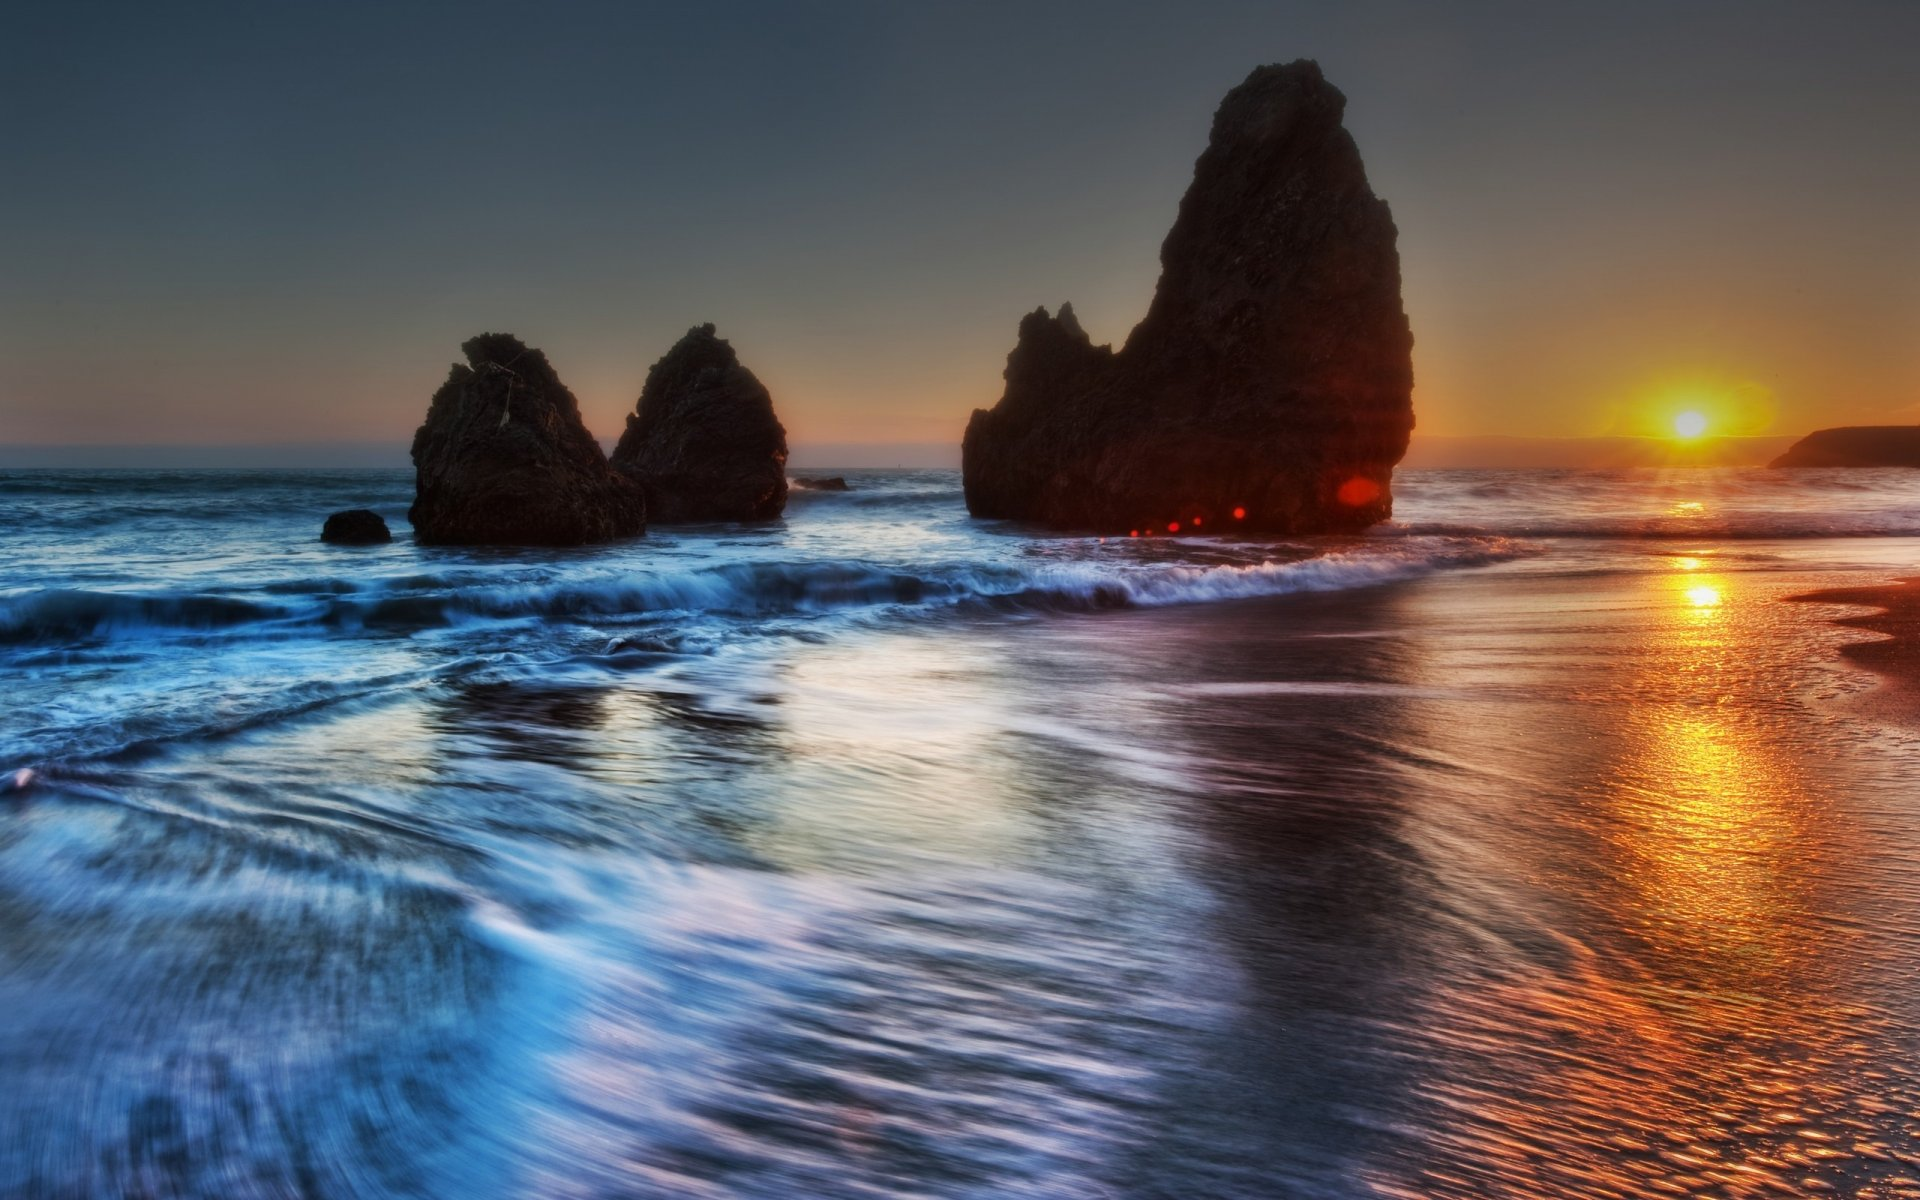 вечерний пейзаж на море картинки себя как